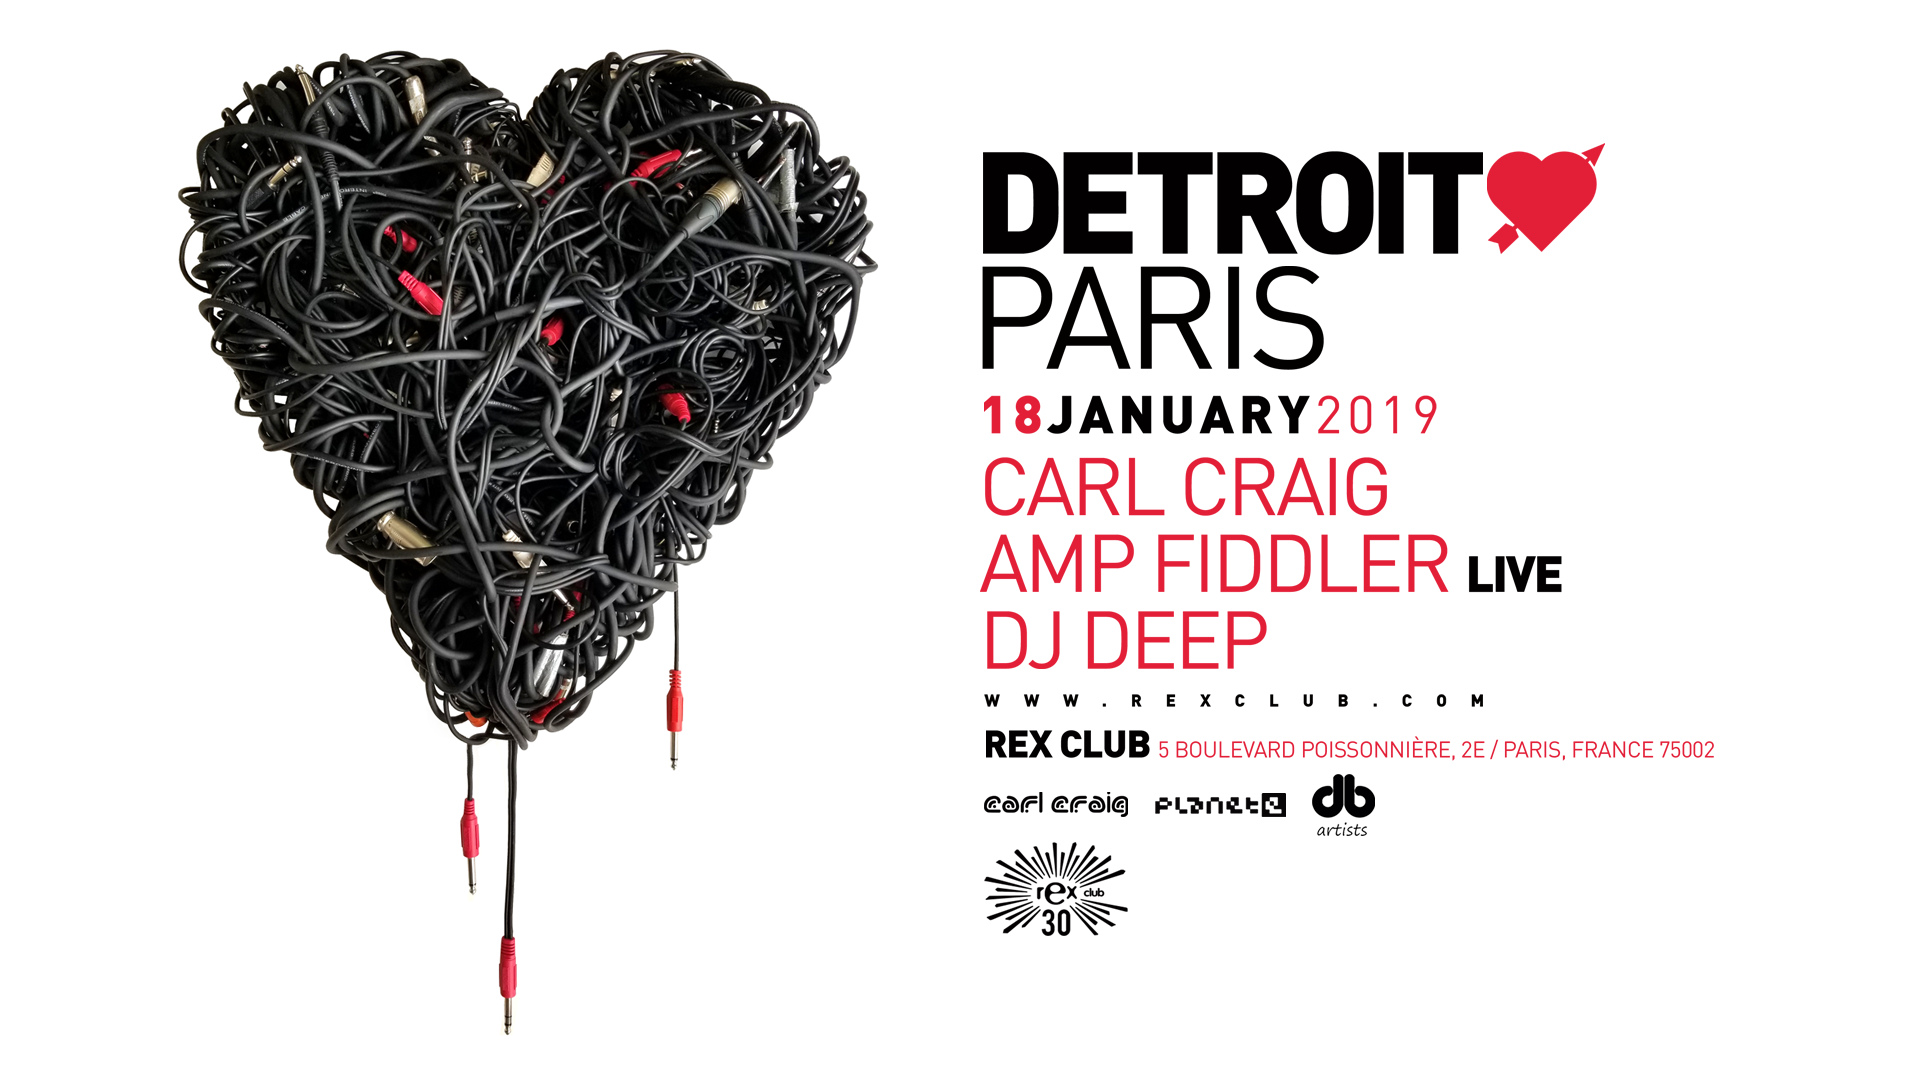 Detroit Love Paris: Carl Craig, Amp Fiddler Live, DJ Deep